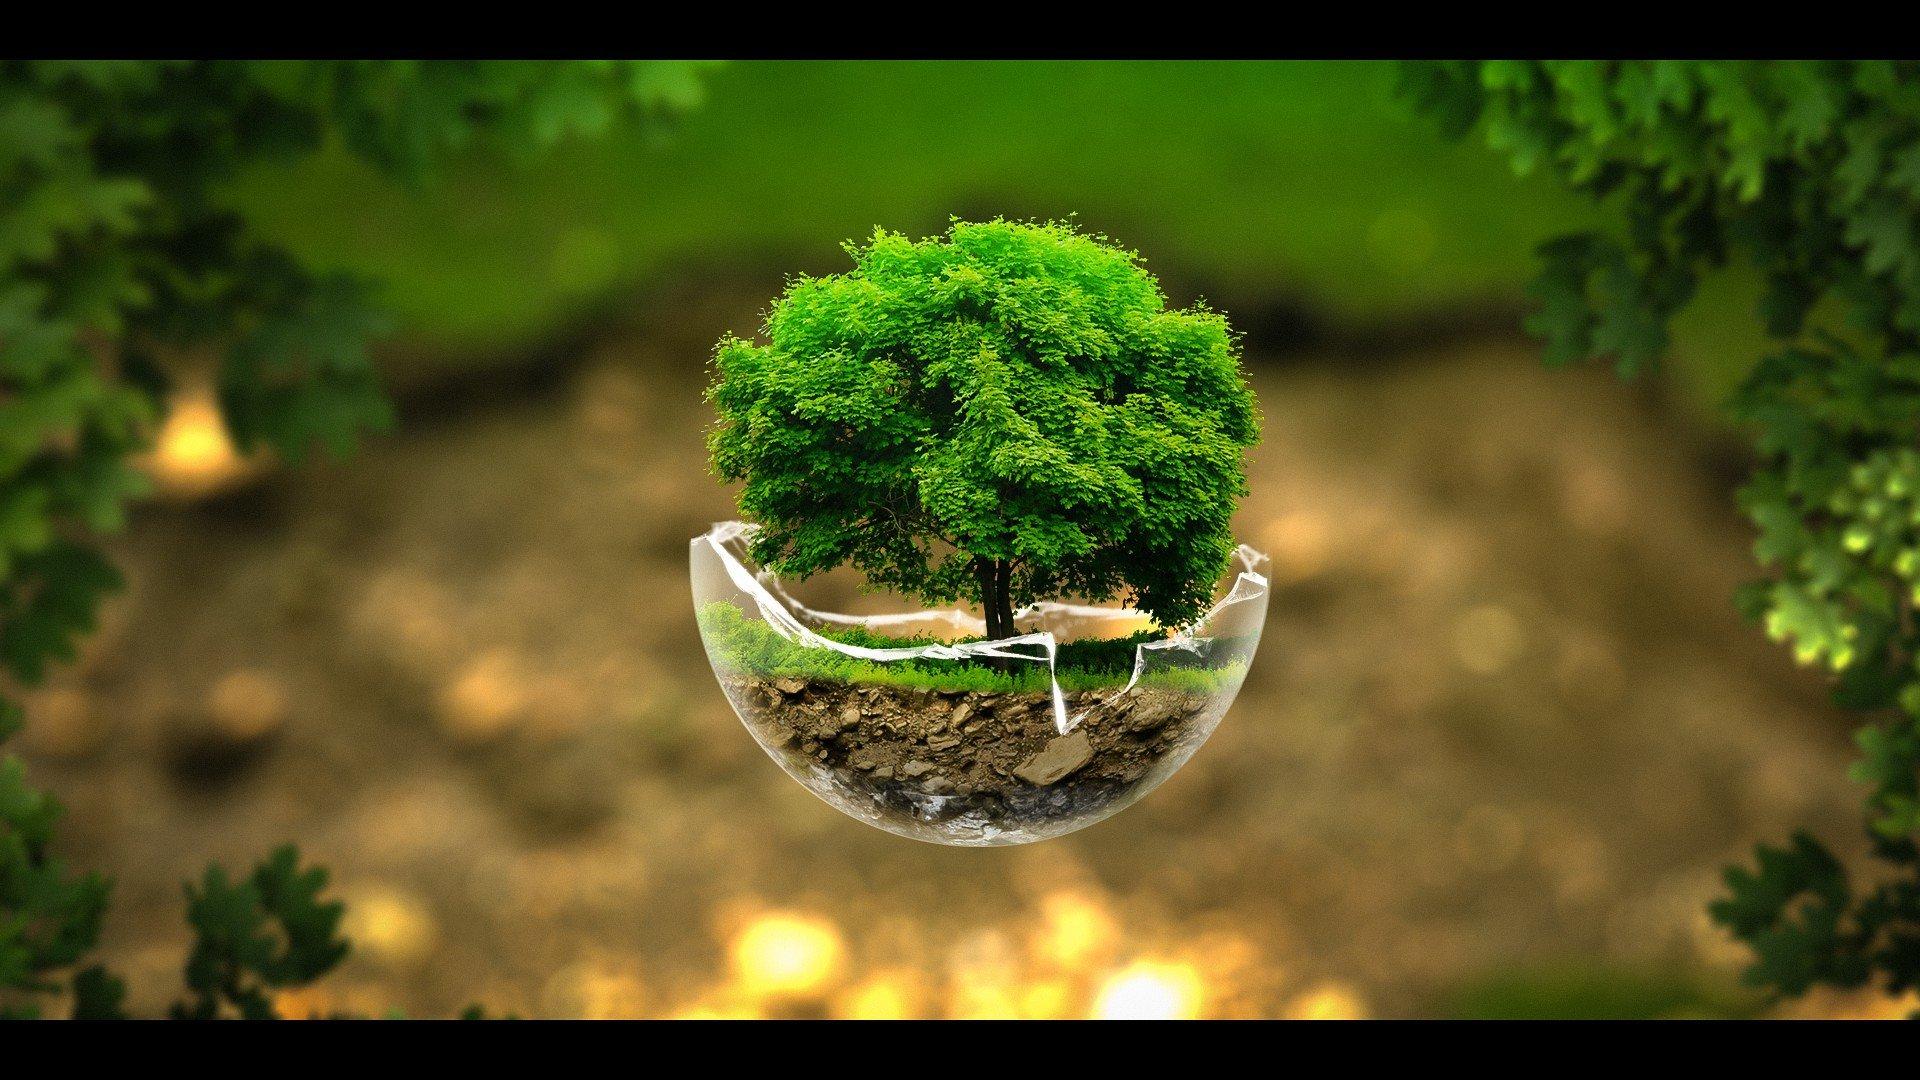 Unduh 61 Background Hd Tree HD Gratis